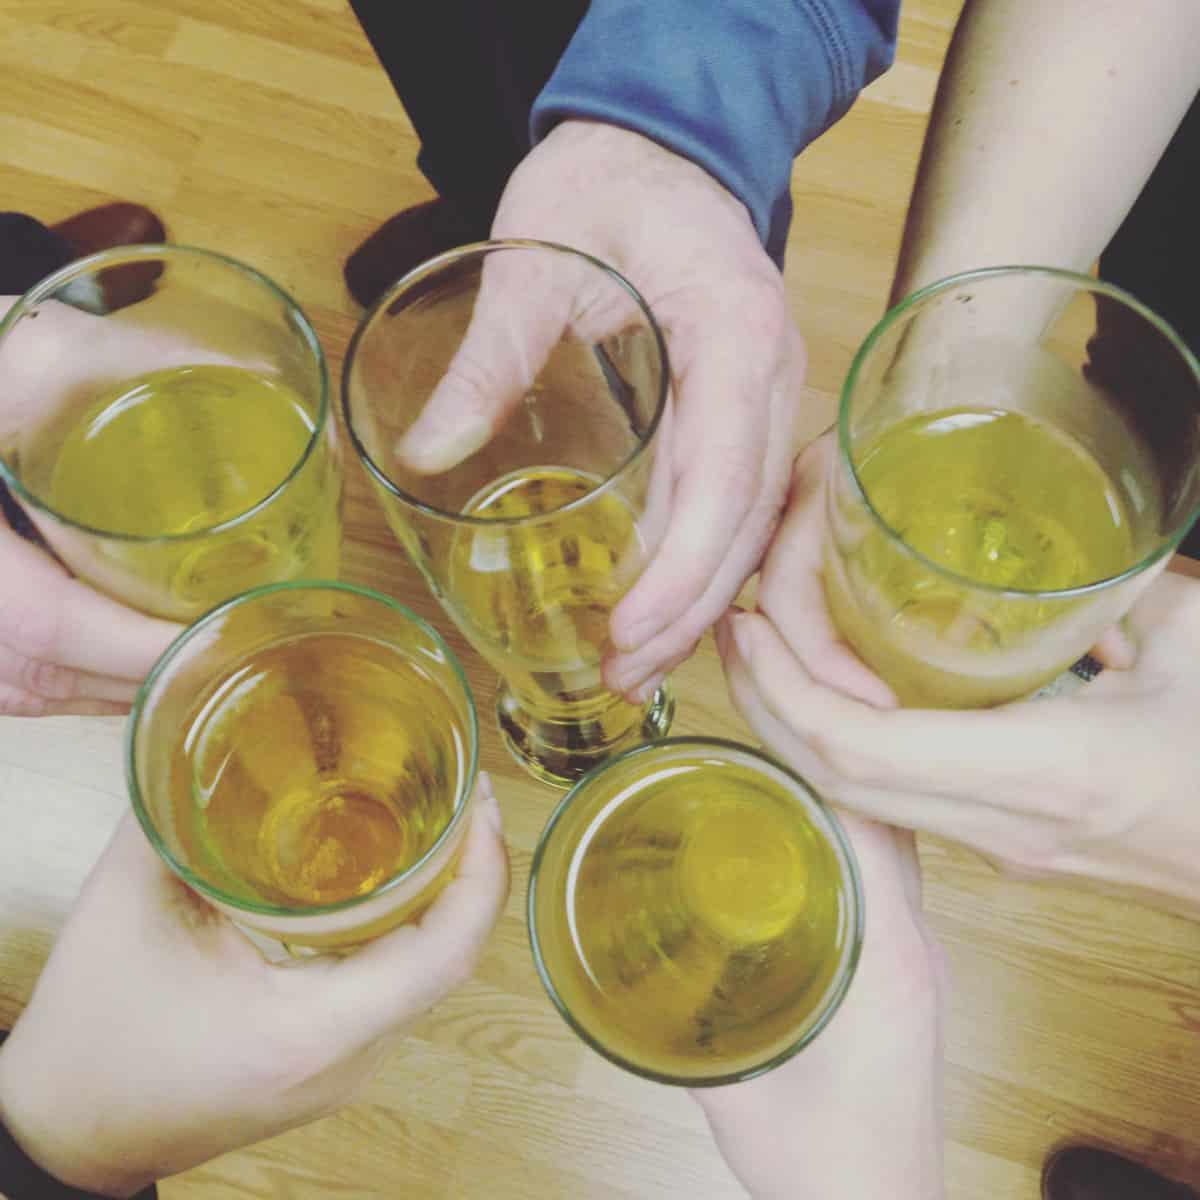 Cider Cheers